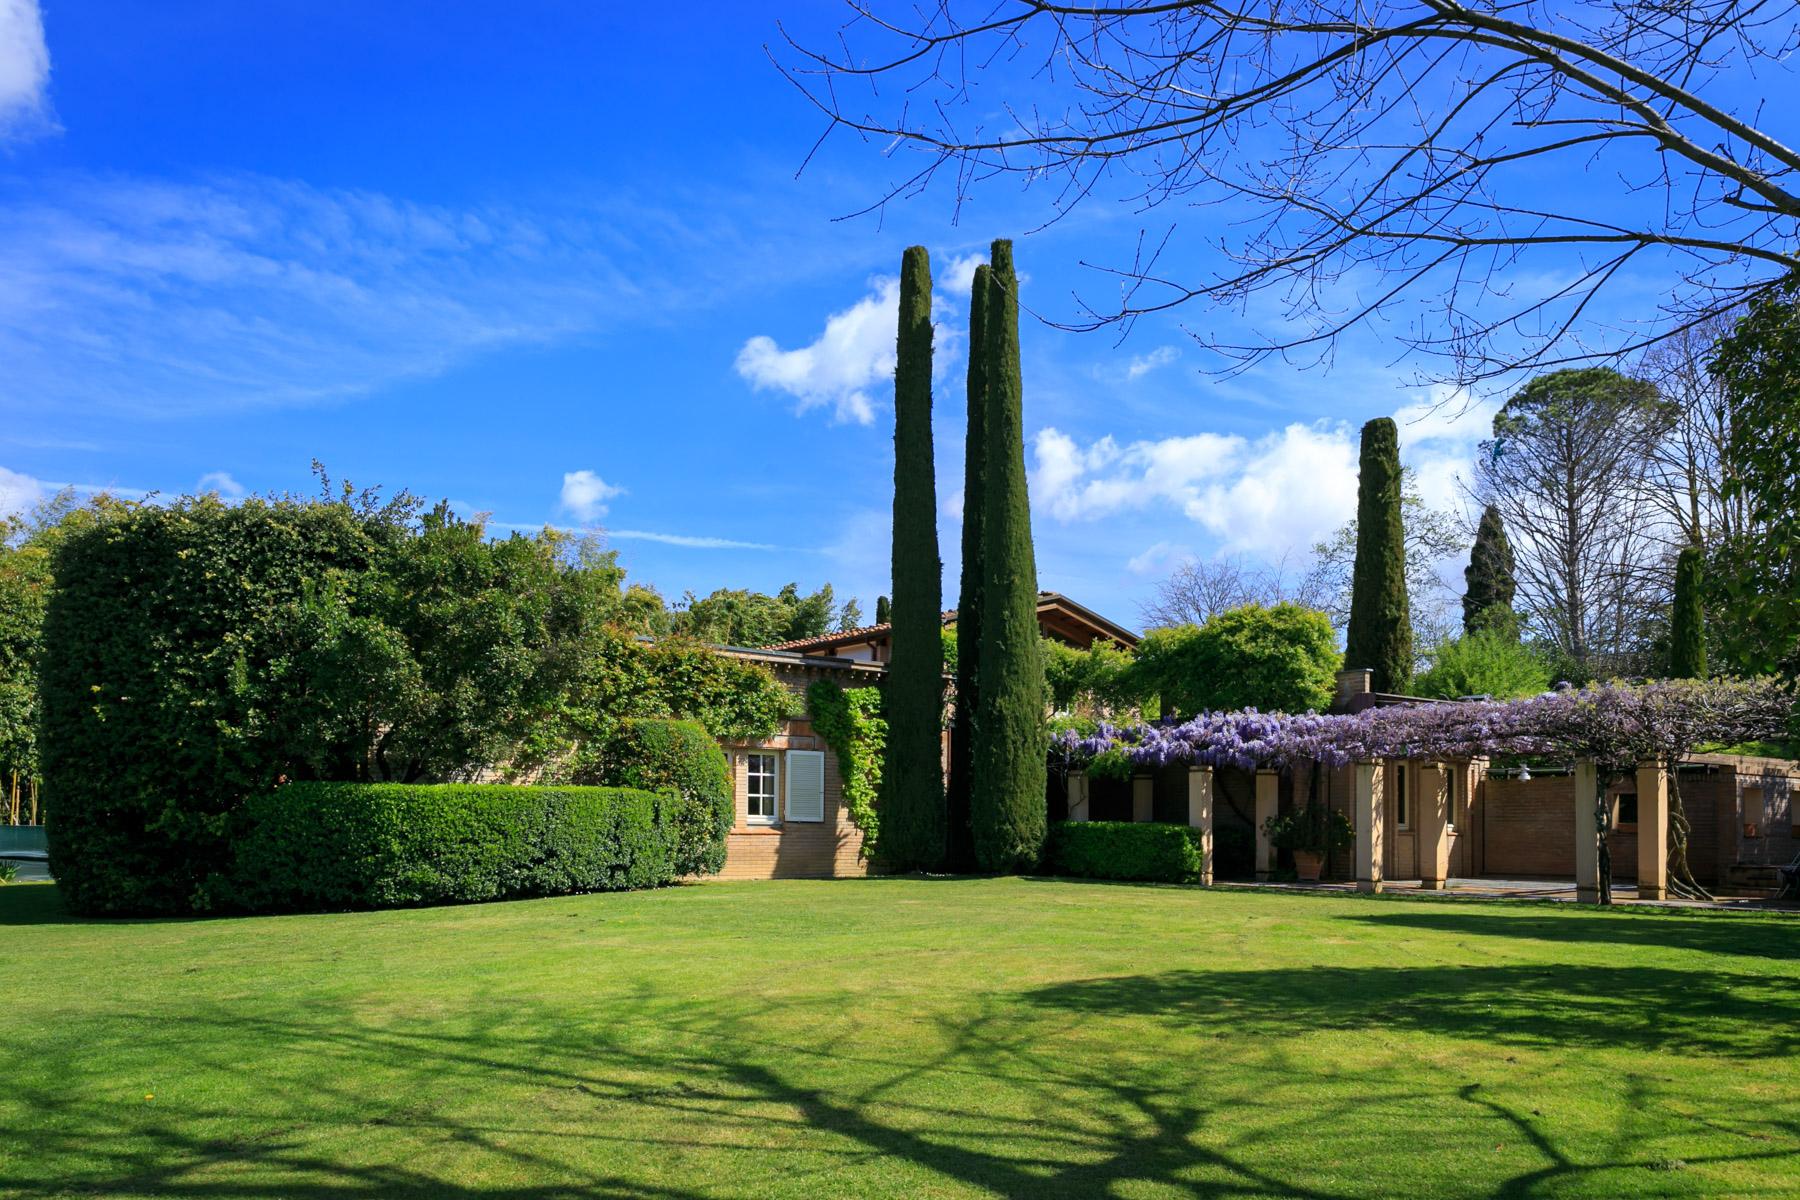 Villa in Vendita a Lucca: 5 locali, 500 mq - Foto 2